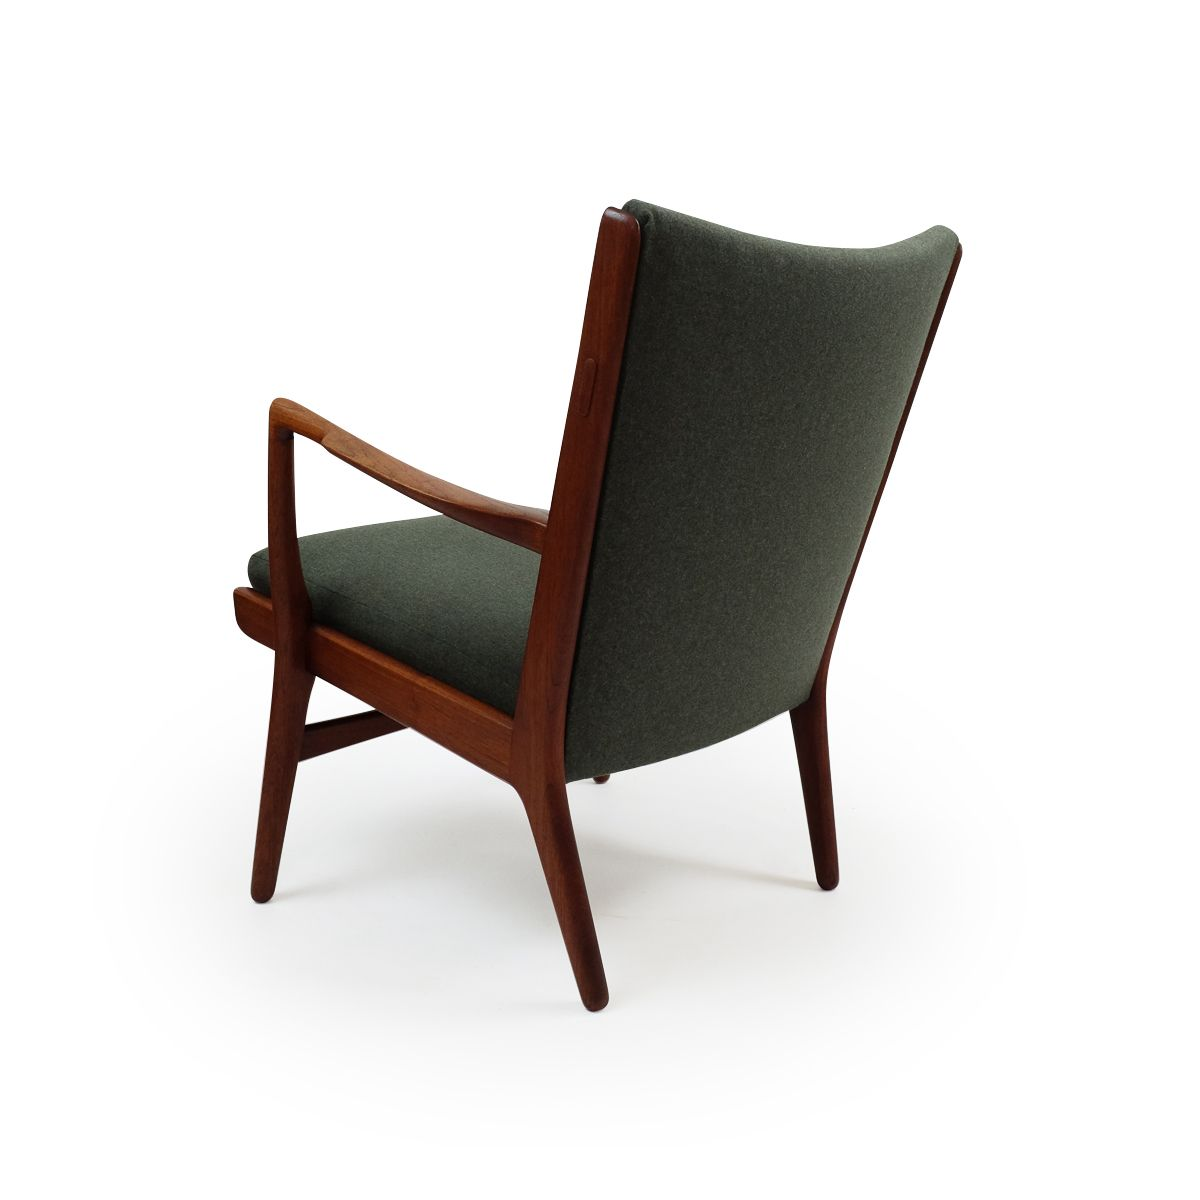 modell ap16 sessel von hans j wegner f r a p stolen. Black Bedroom Furniture Sets. Home Design Ideas